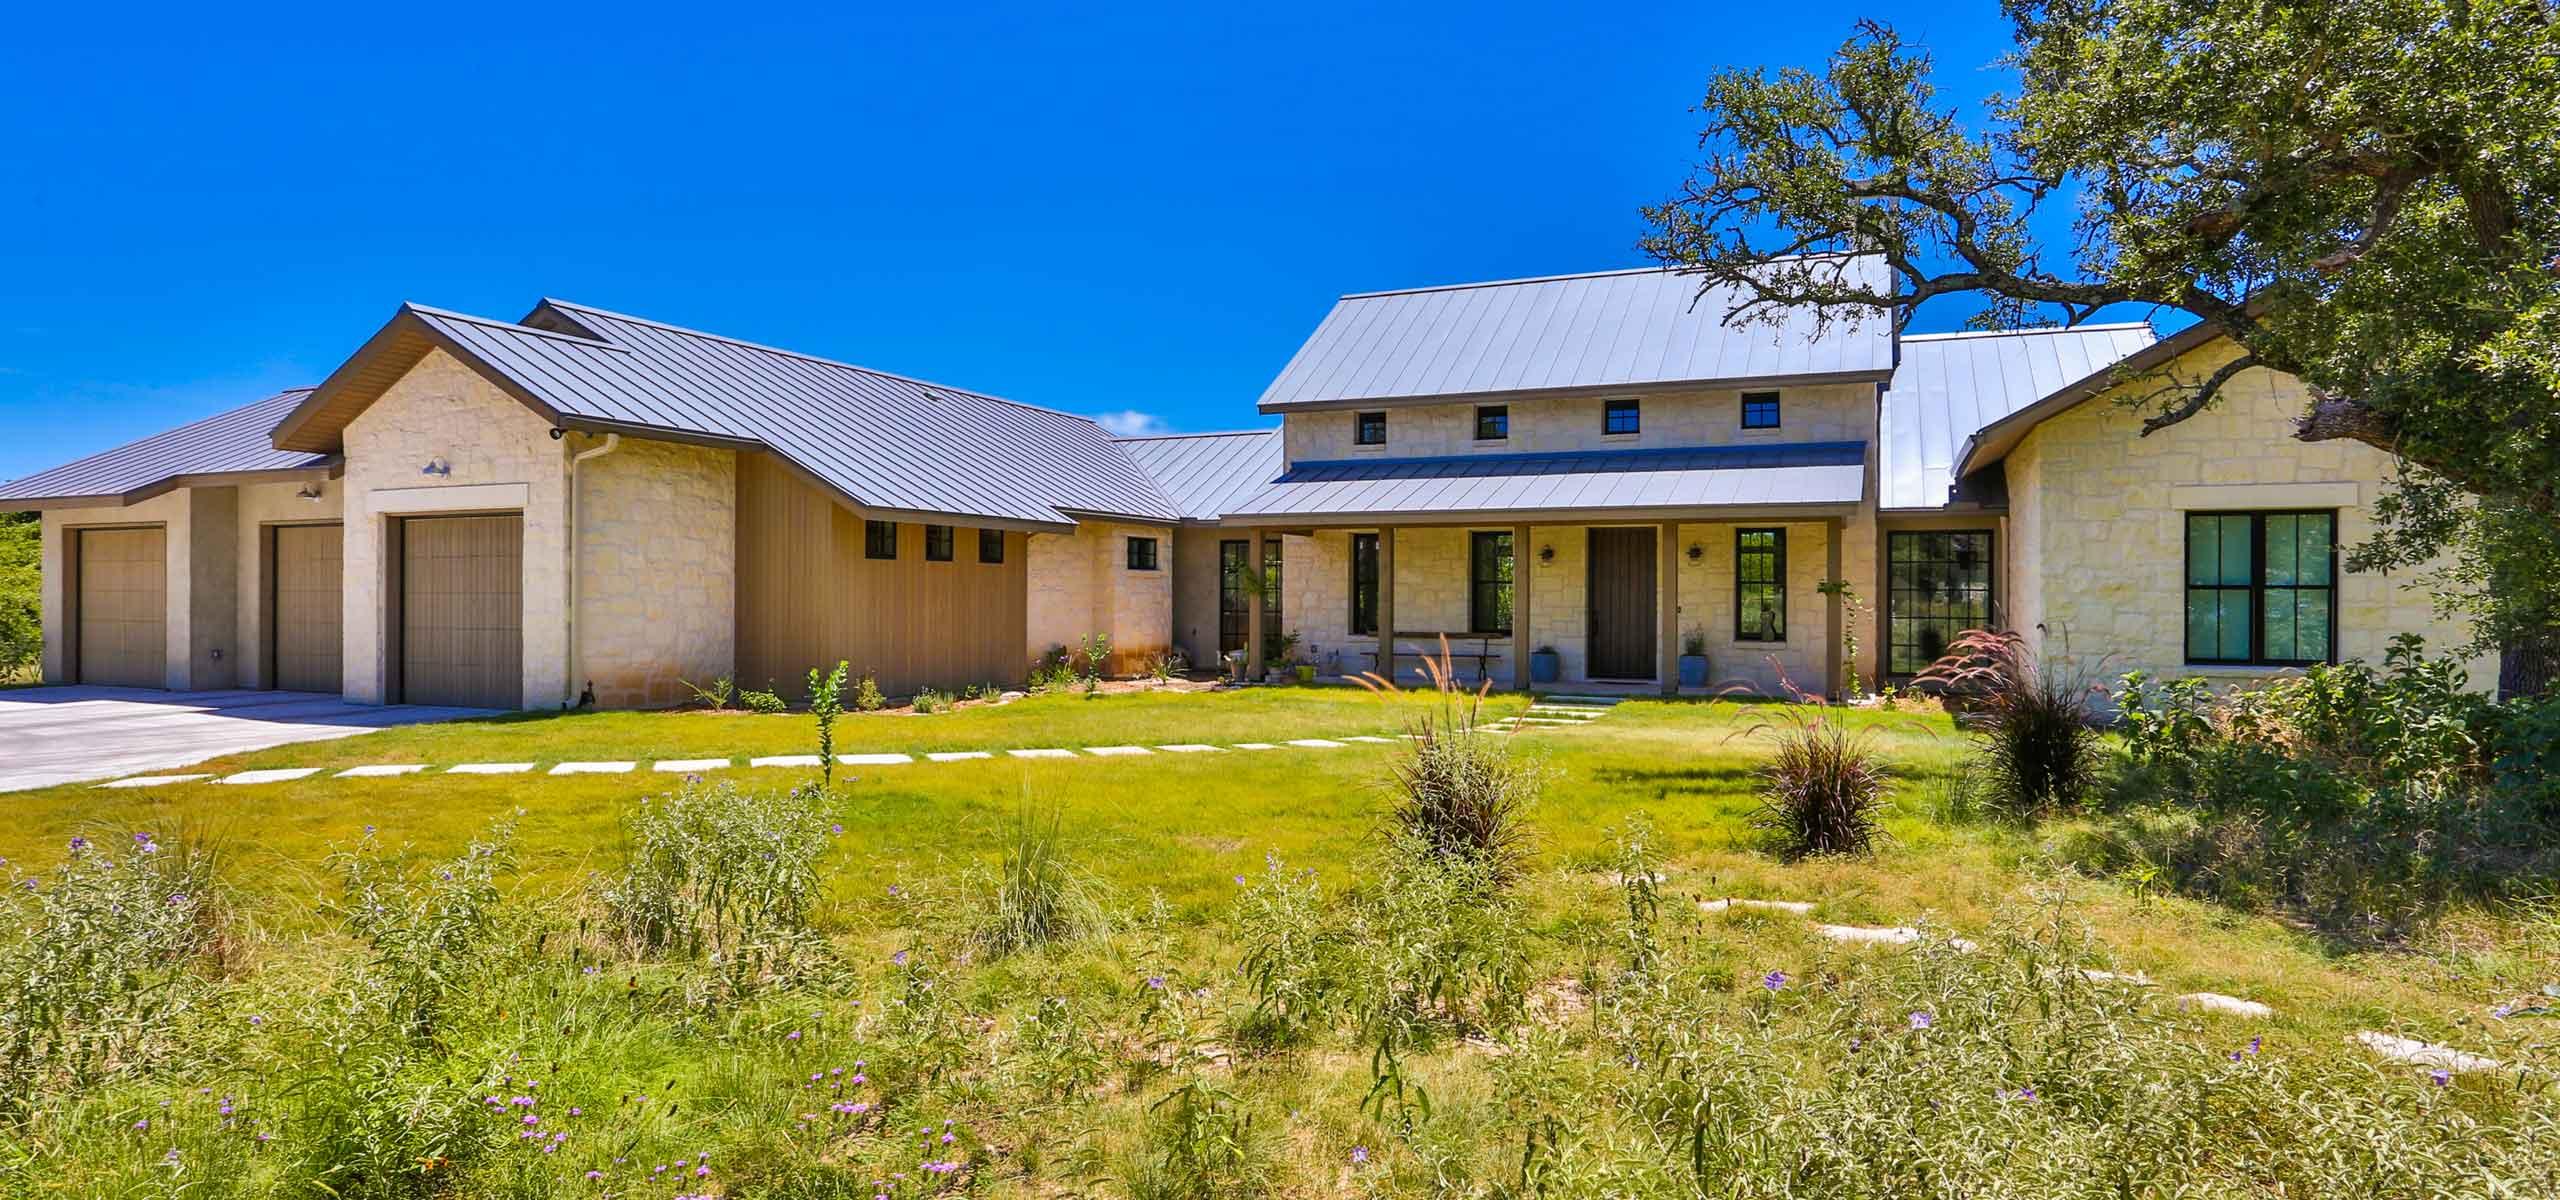 Estate homes texas home plans for Estate home plans